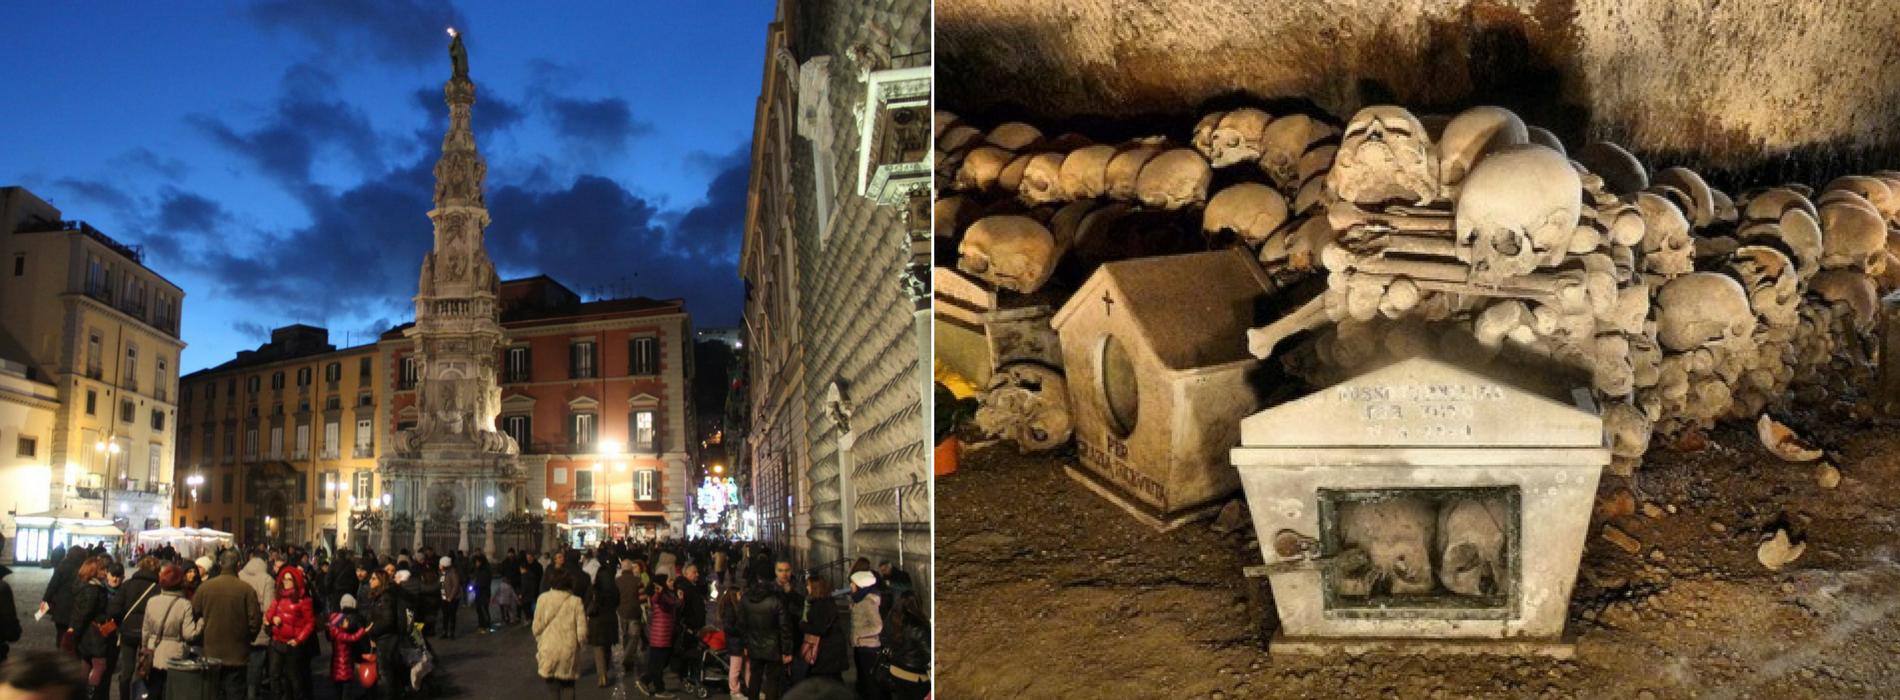 Visita guidata notturna alla Napoli Esoterica